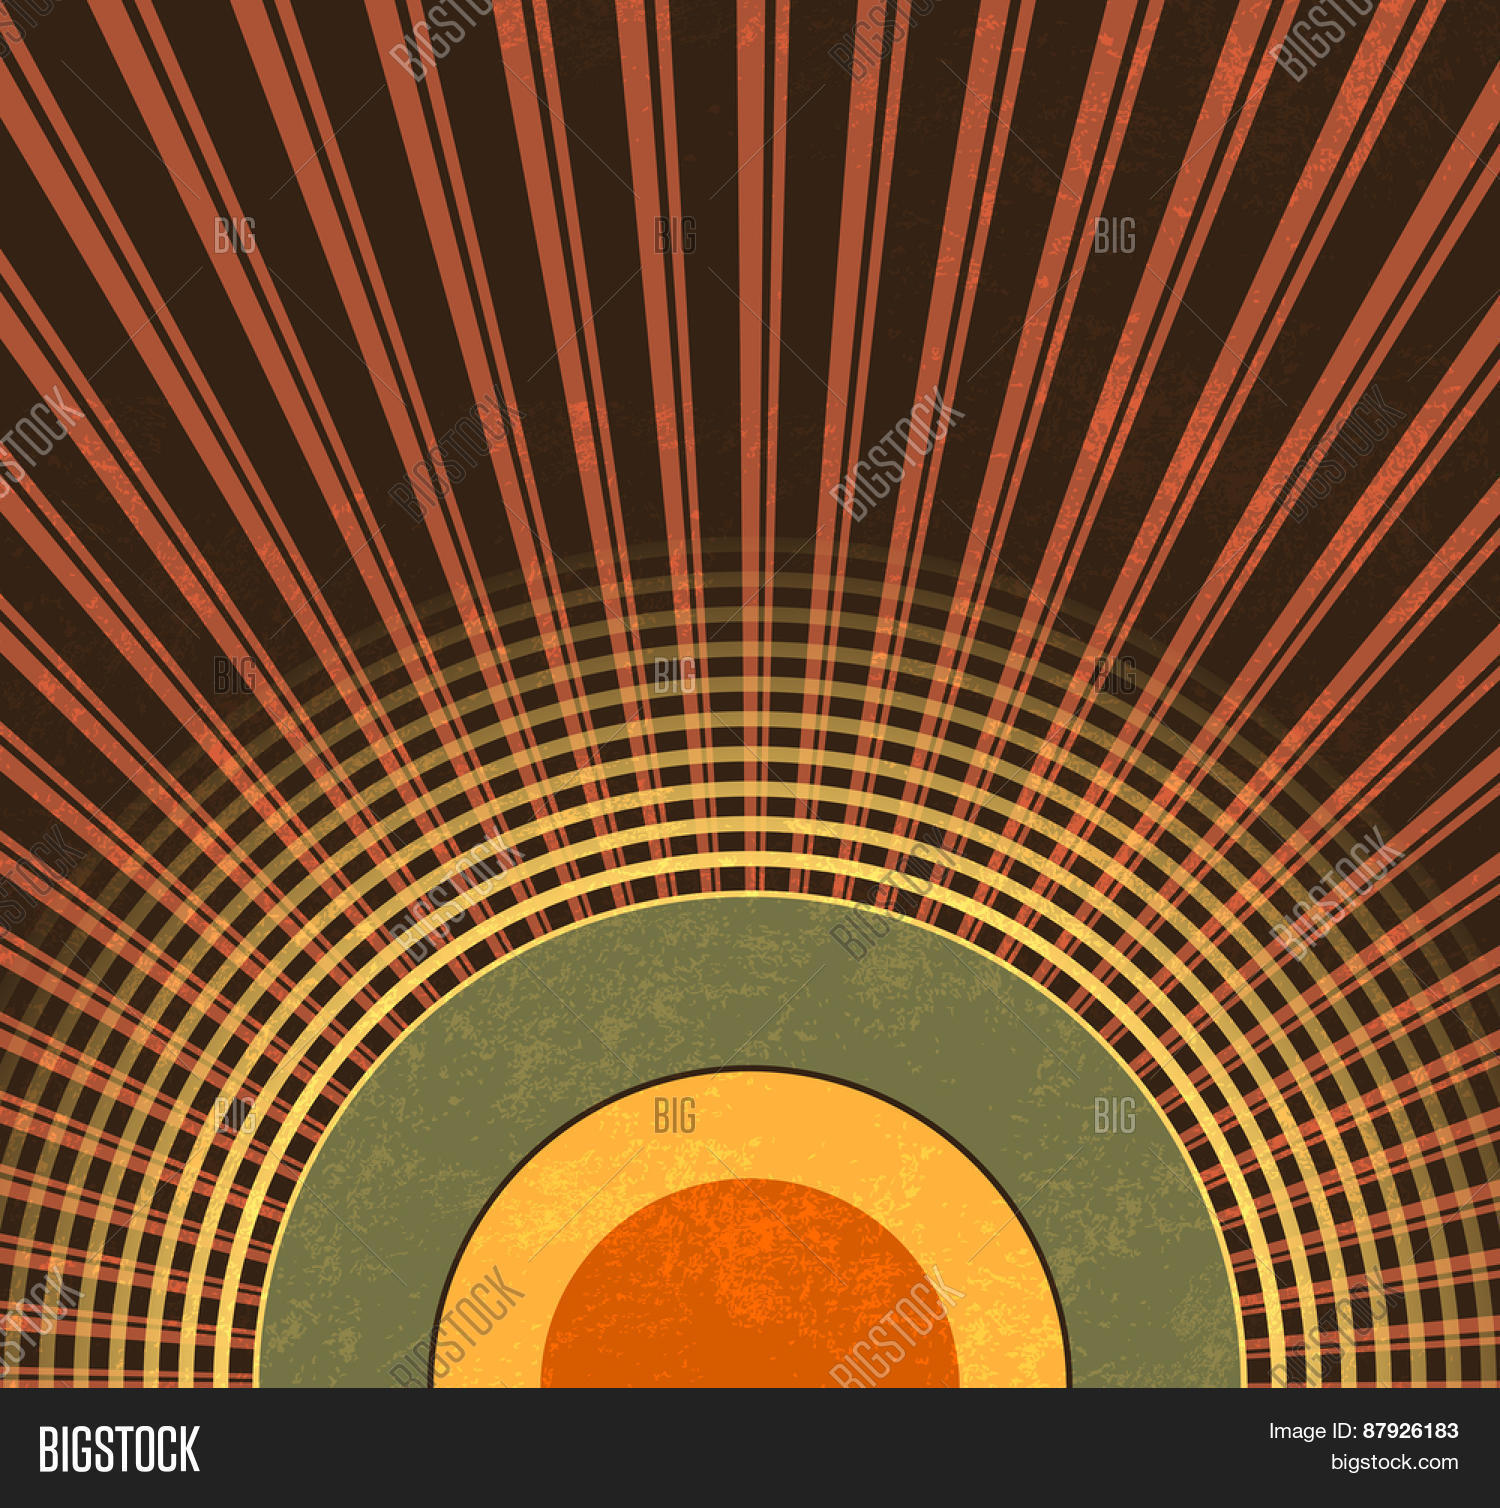 Retro background   abstract grunge radio waves   vintage 1500x1508